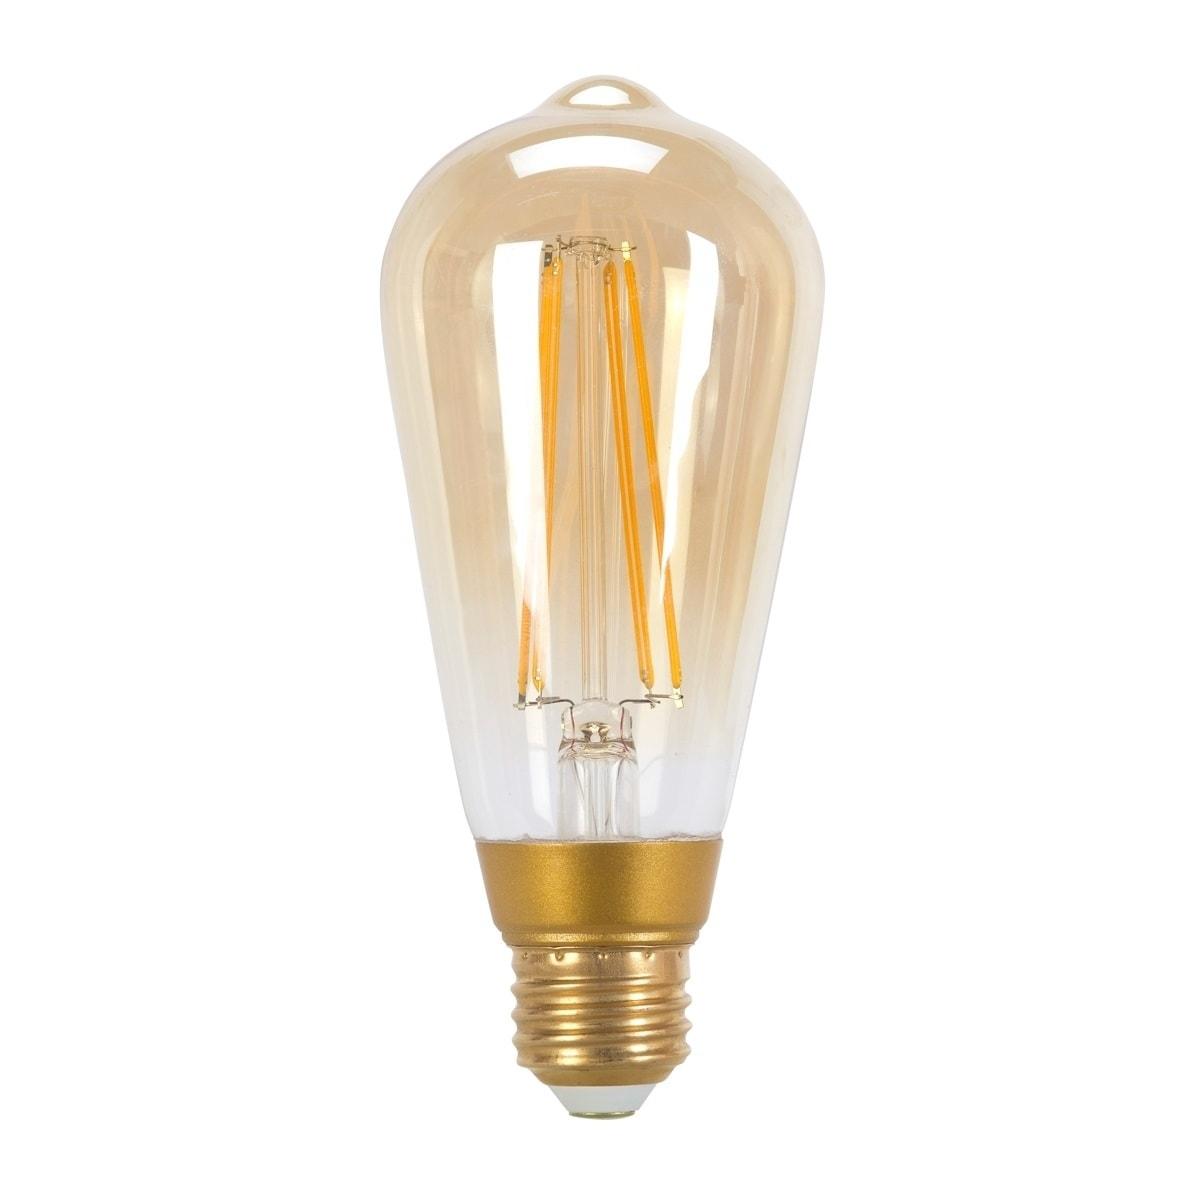 60w Equivalent Vintage Edison Dimmable Led Light Bulb E26